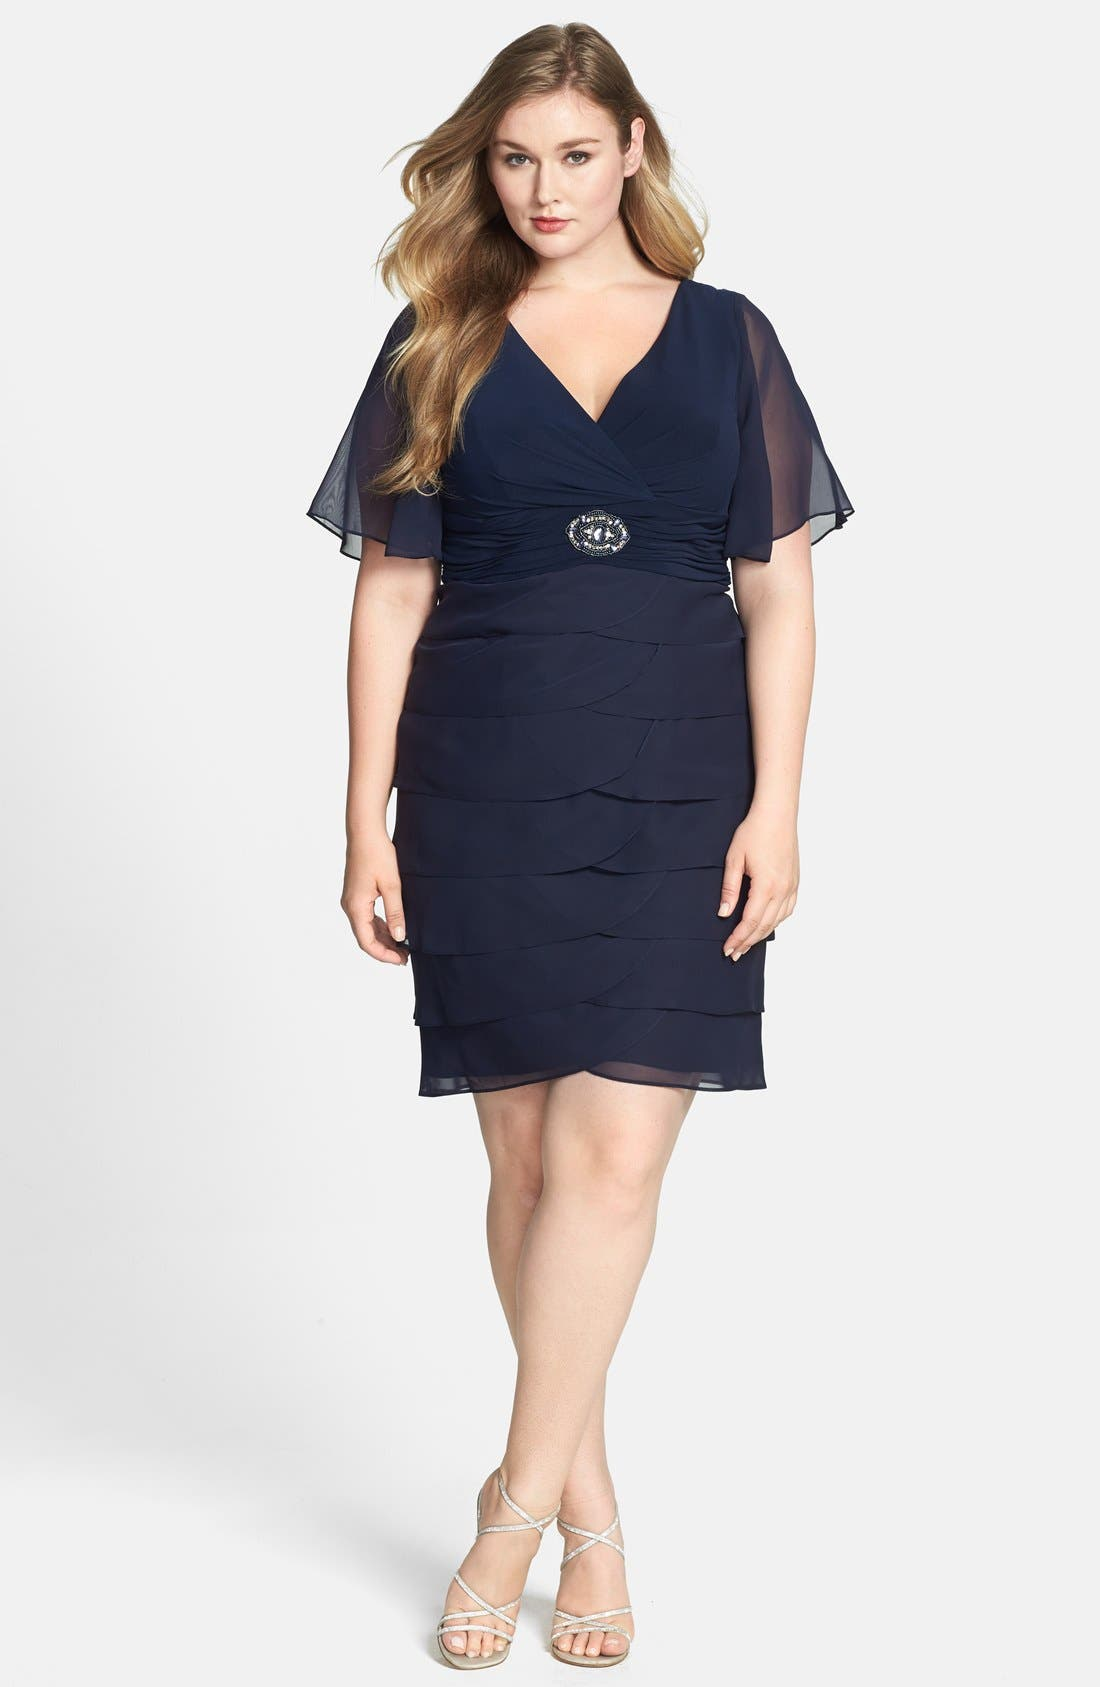 Alternate Image 1 Selected - Jessica Howard 'Artichoke' Flutter Sleeve Chiffon Dress (Plus Size)